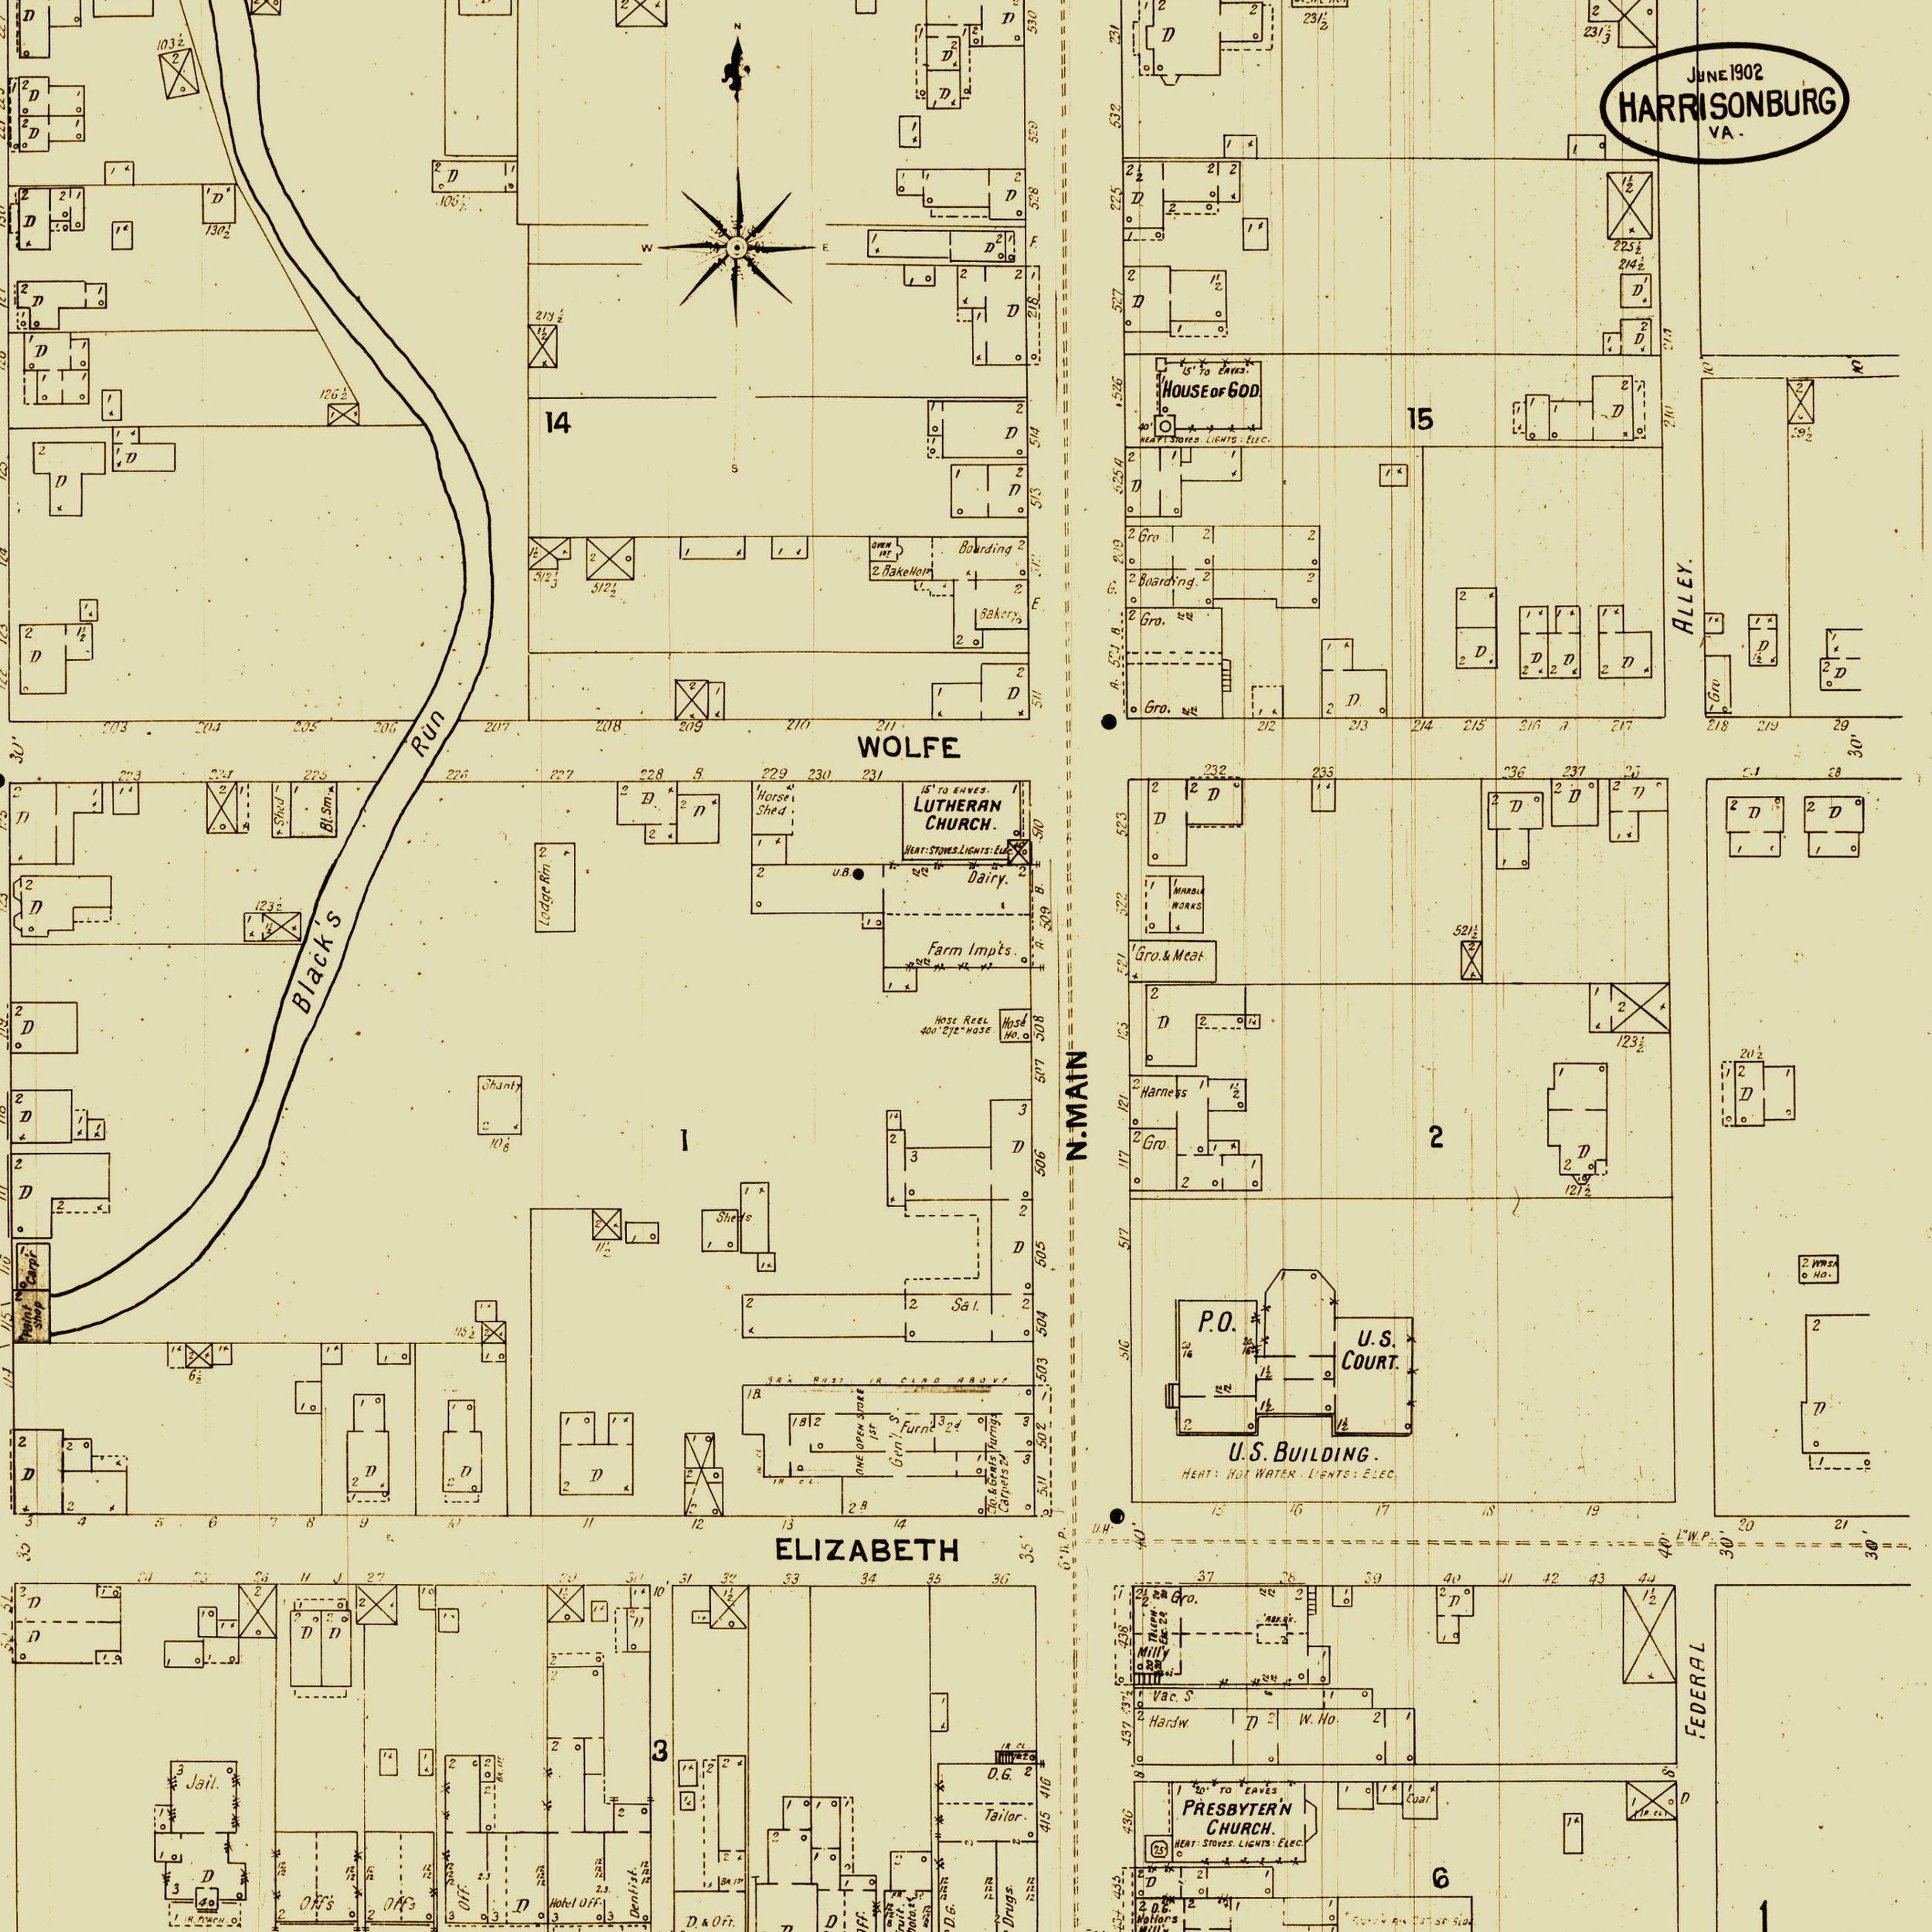 1902 Sanborn Map Sepia.jpg